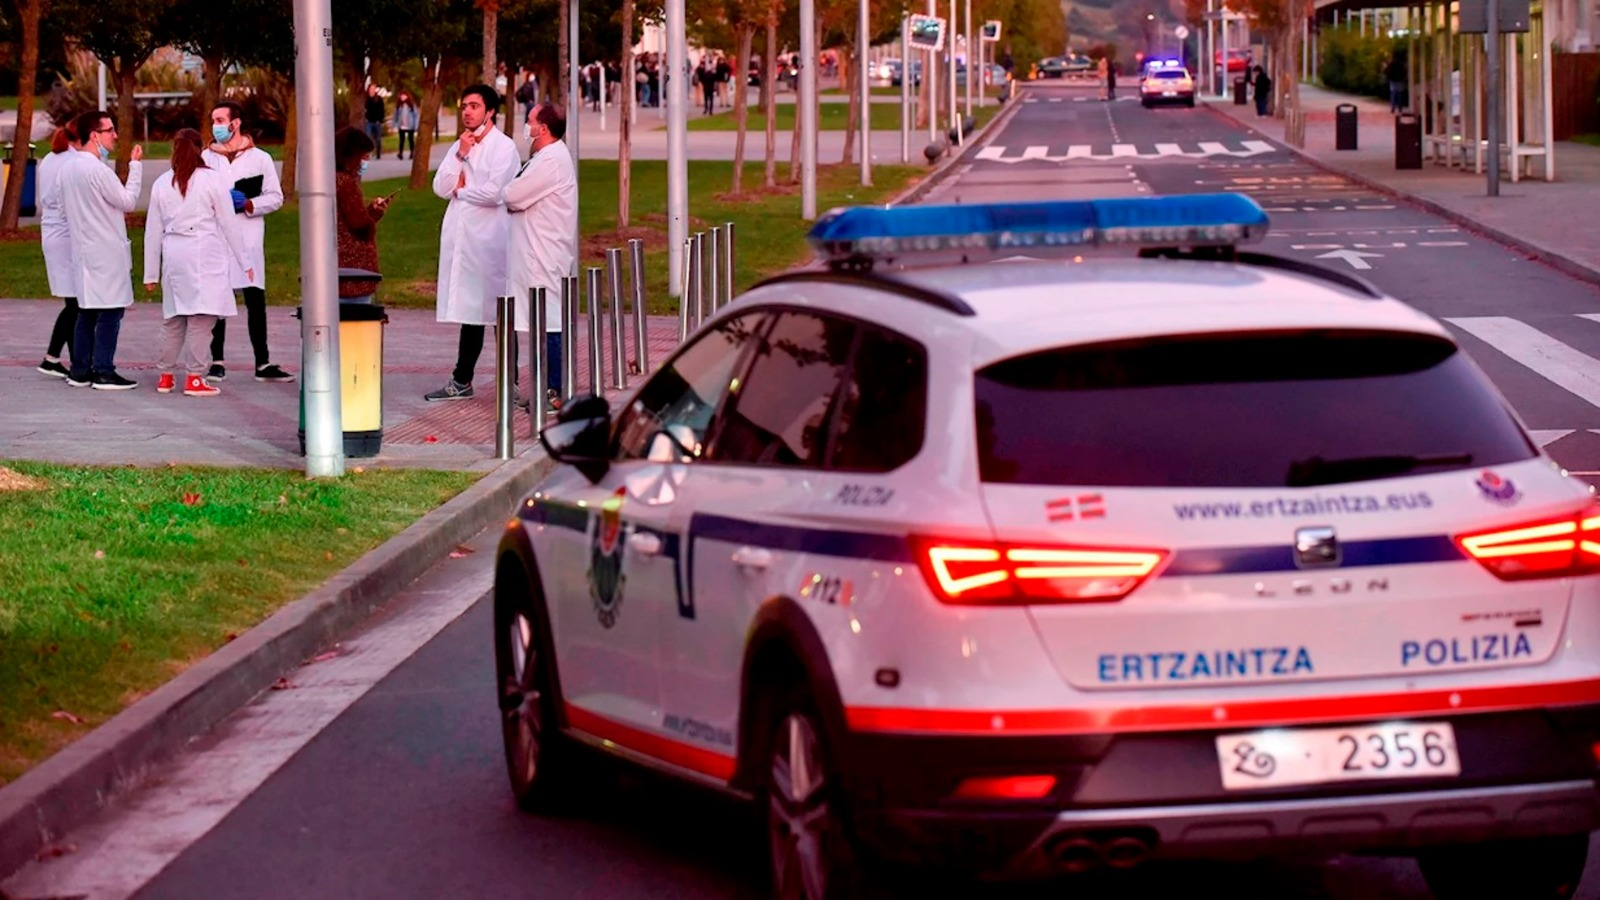 Arrested Vizcaia